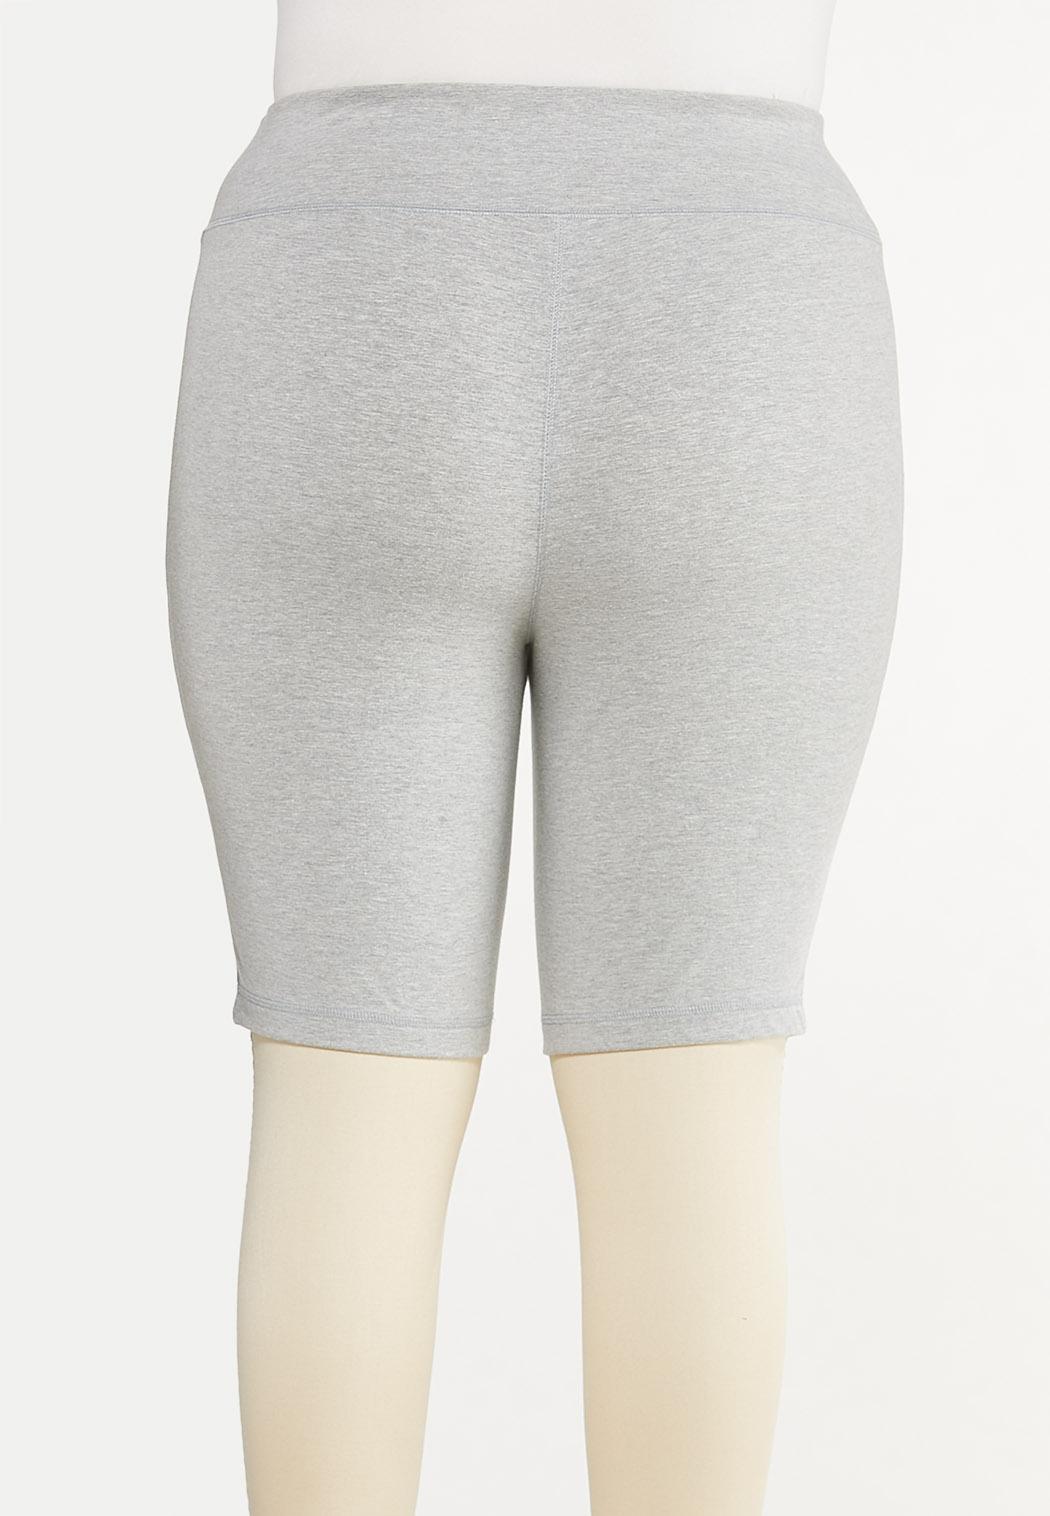 Plus Size Heather Gray Biker Shorts (Item #44578818)